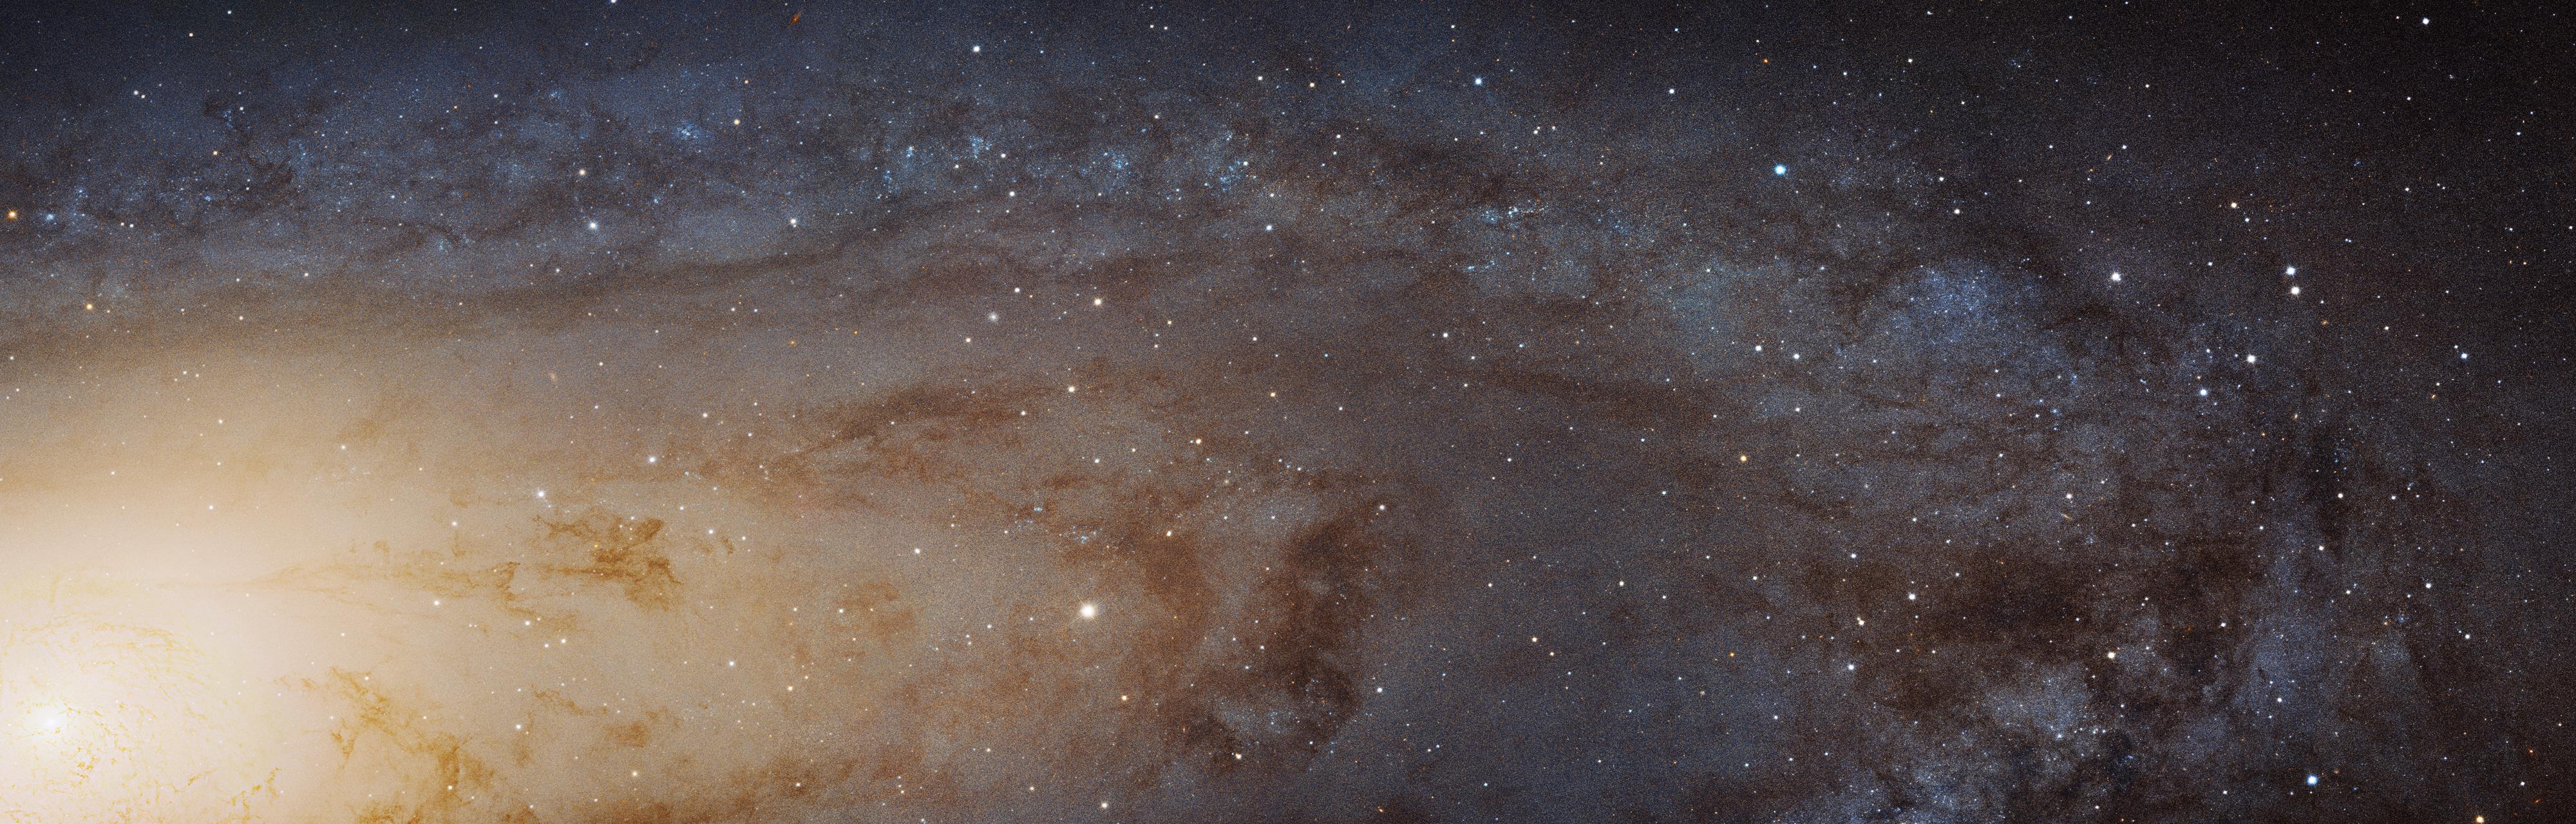 Gigapixels of Andromeda 4K  YouTube